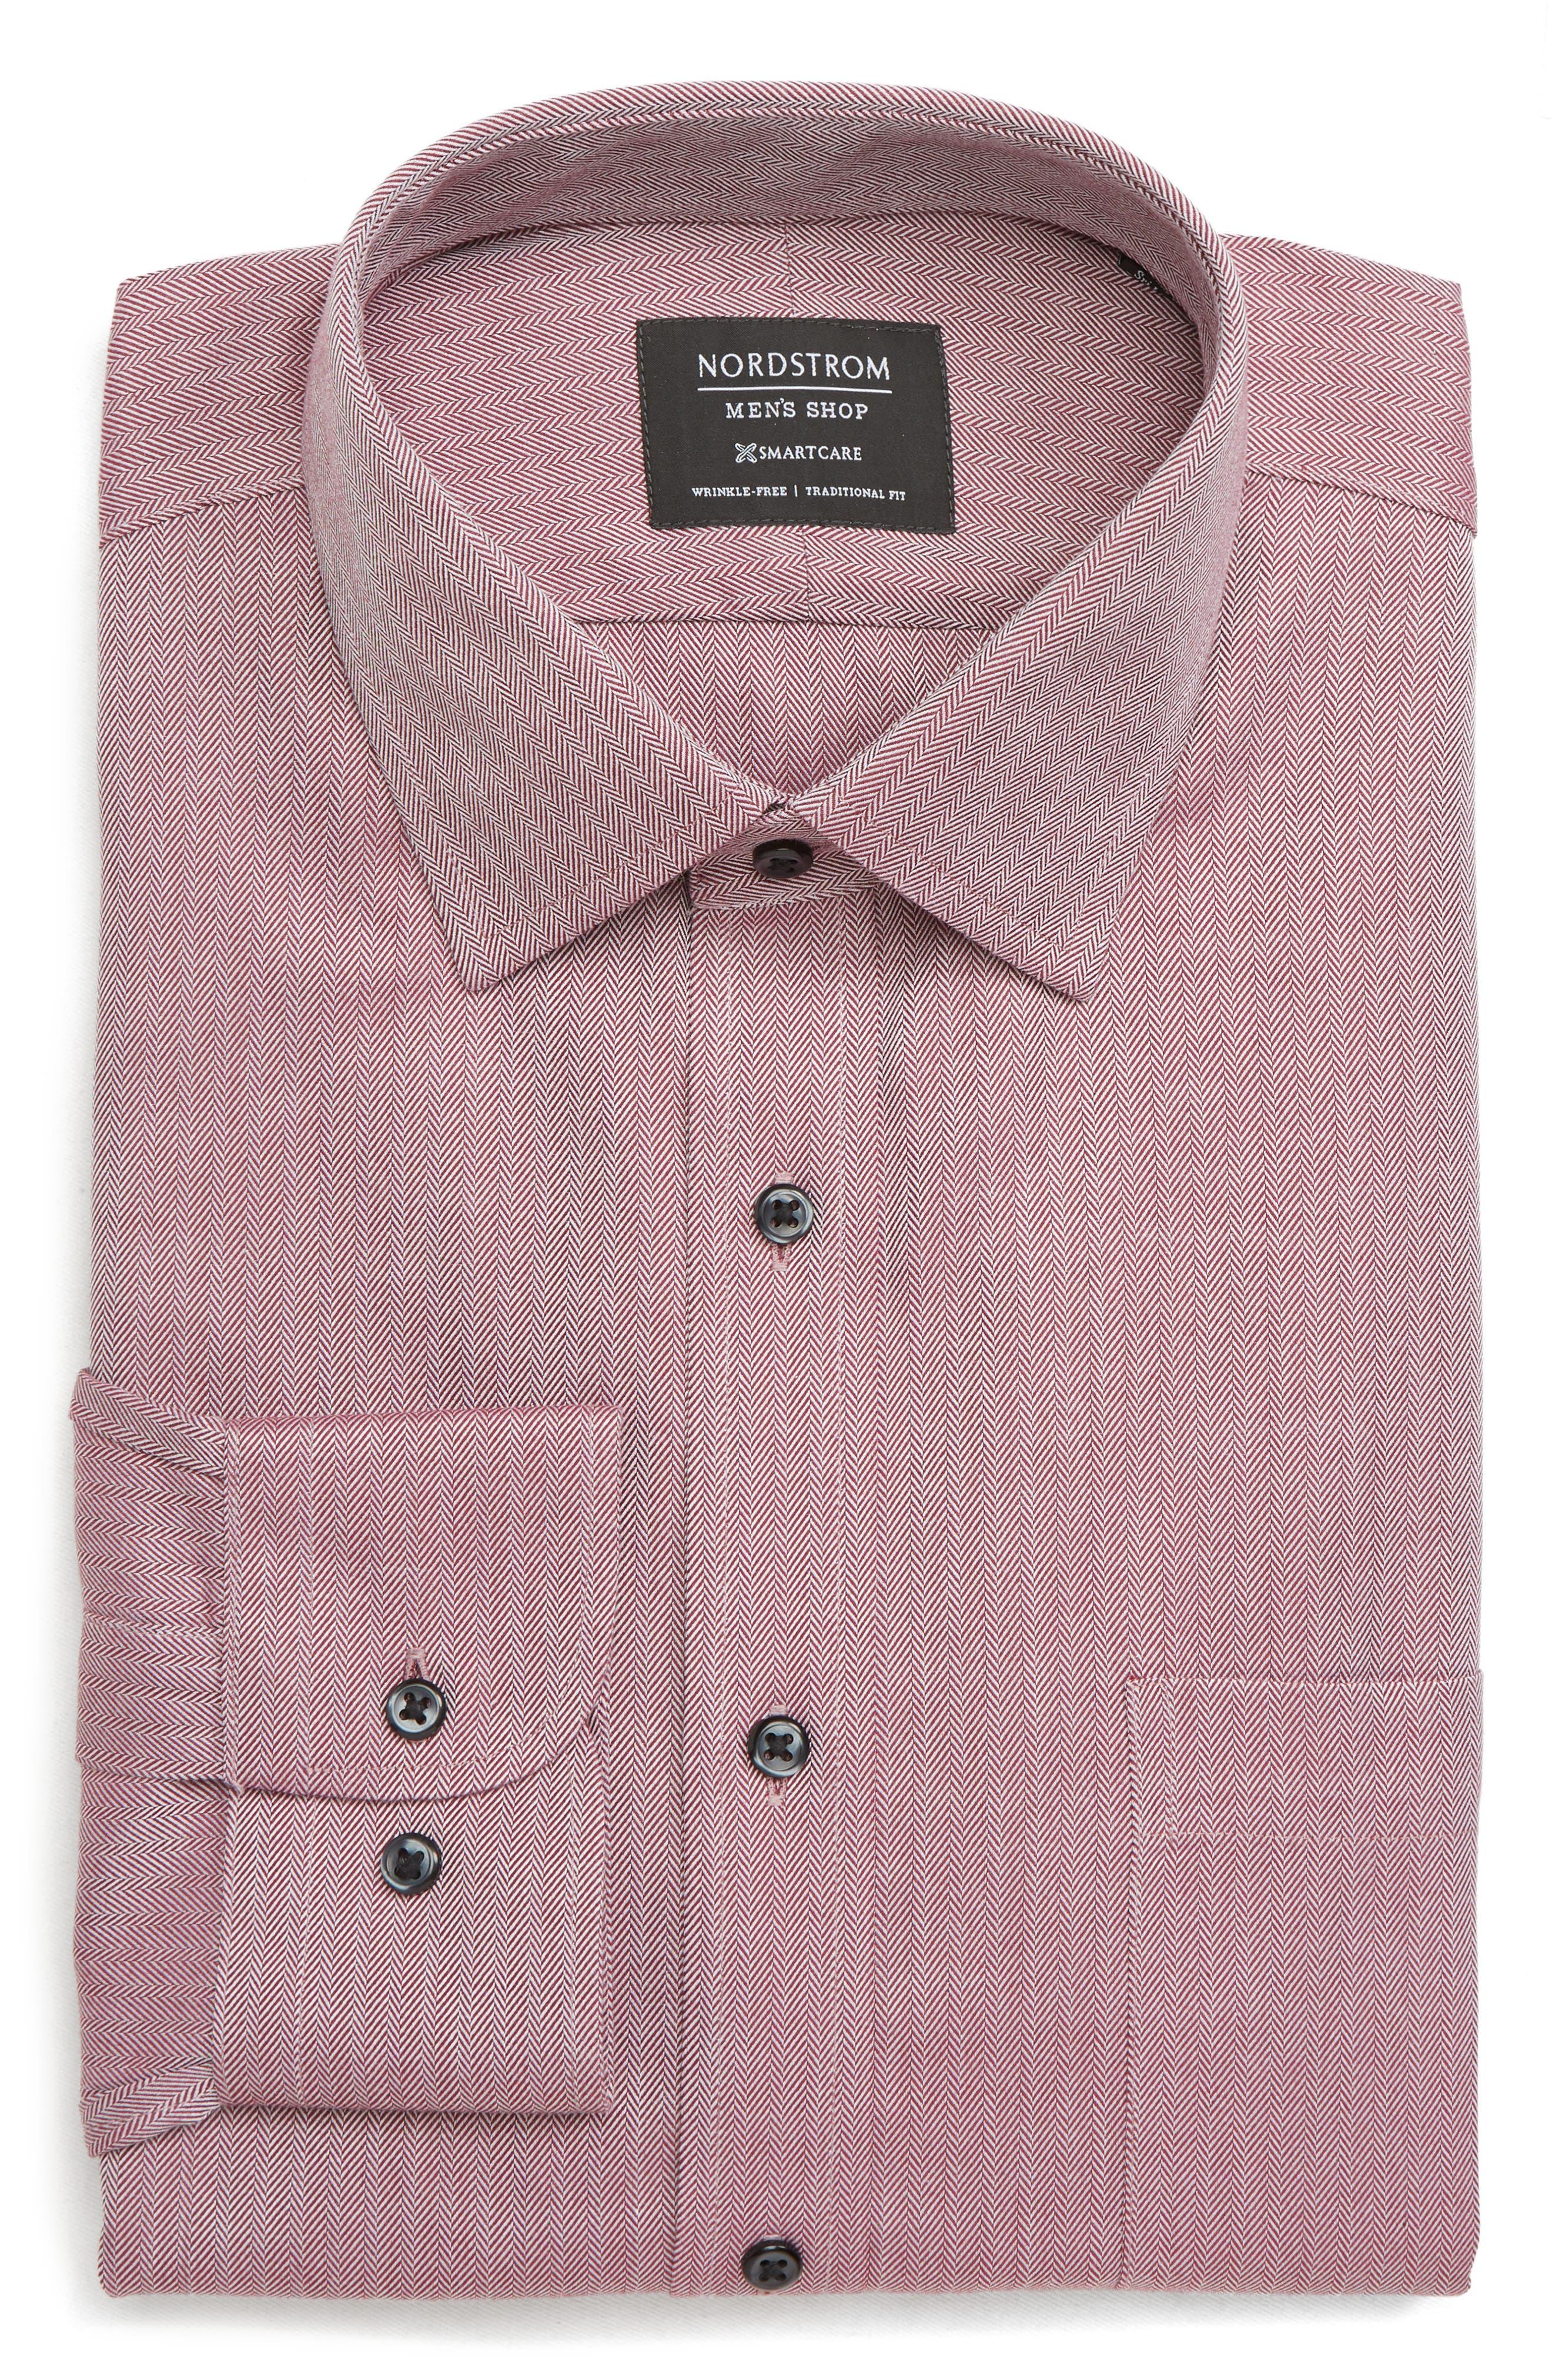 NORDSTROM MEN'S SHOP, Smartcare<sup>™</sup> Traditional Fit Herringbone Dress Shirt, Alternate thumbnail 5, color, BURGUNDY ROYALE